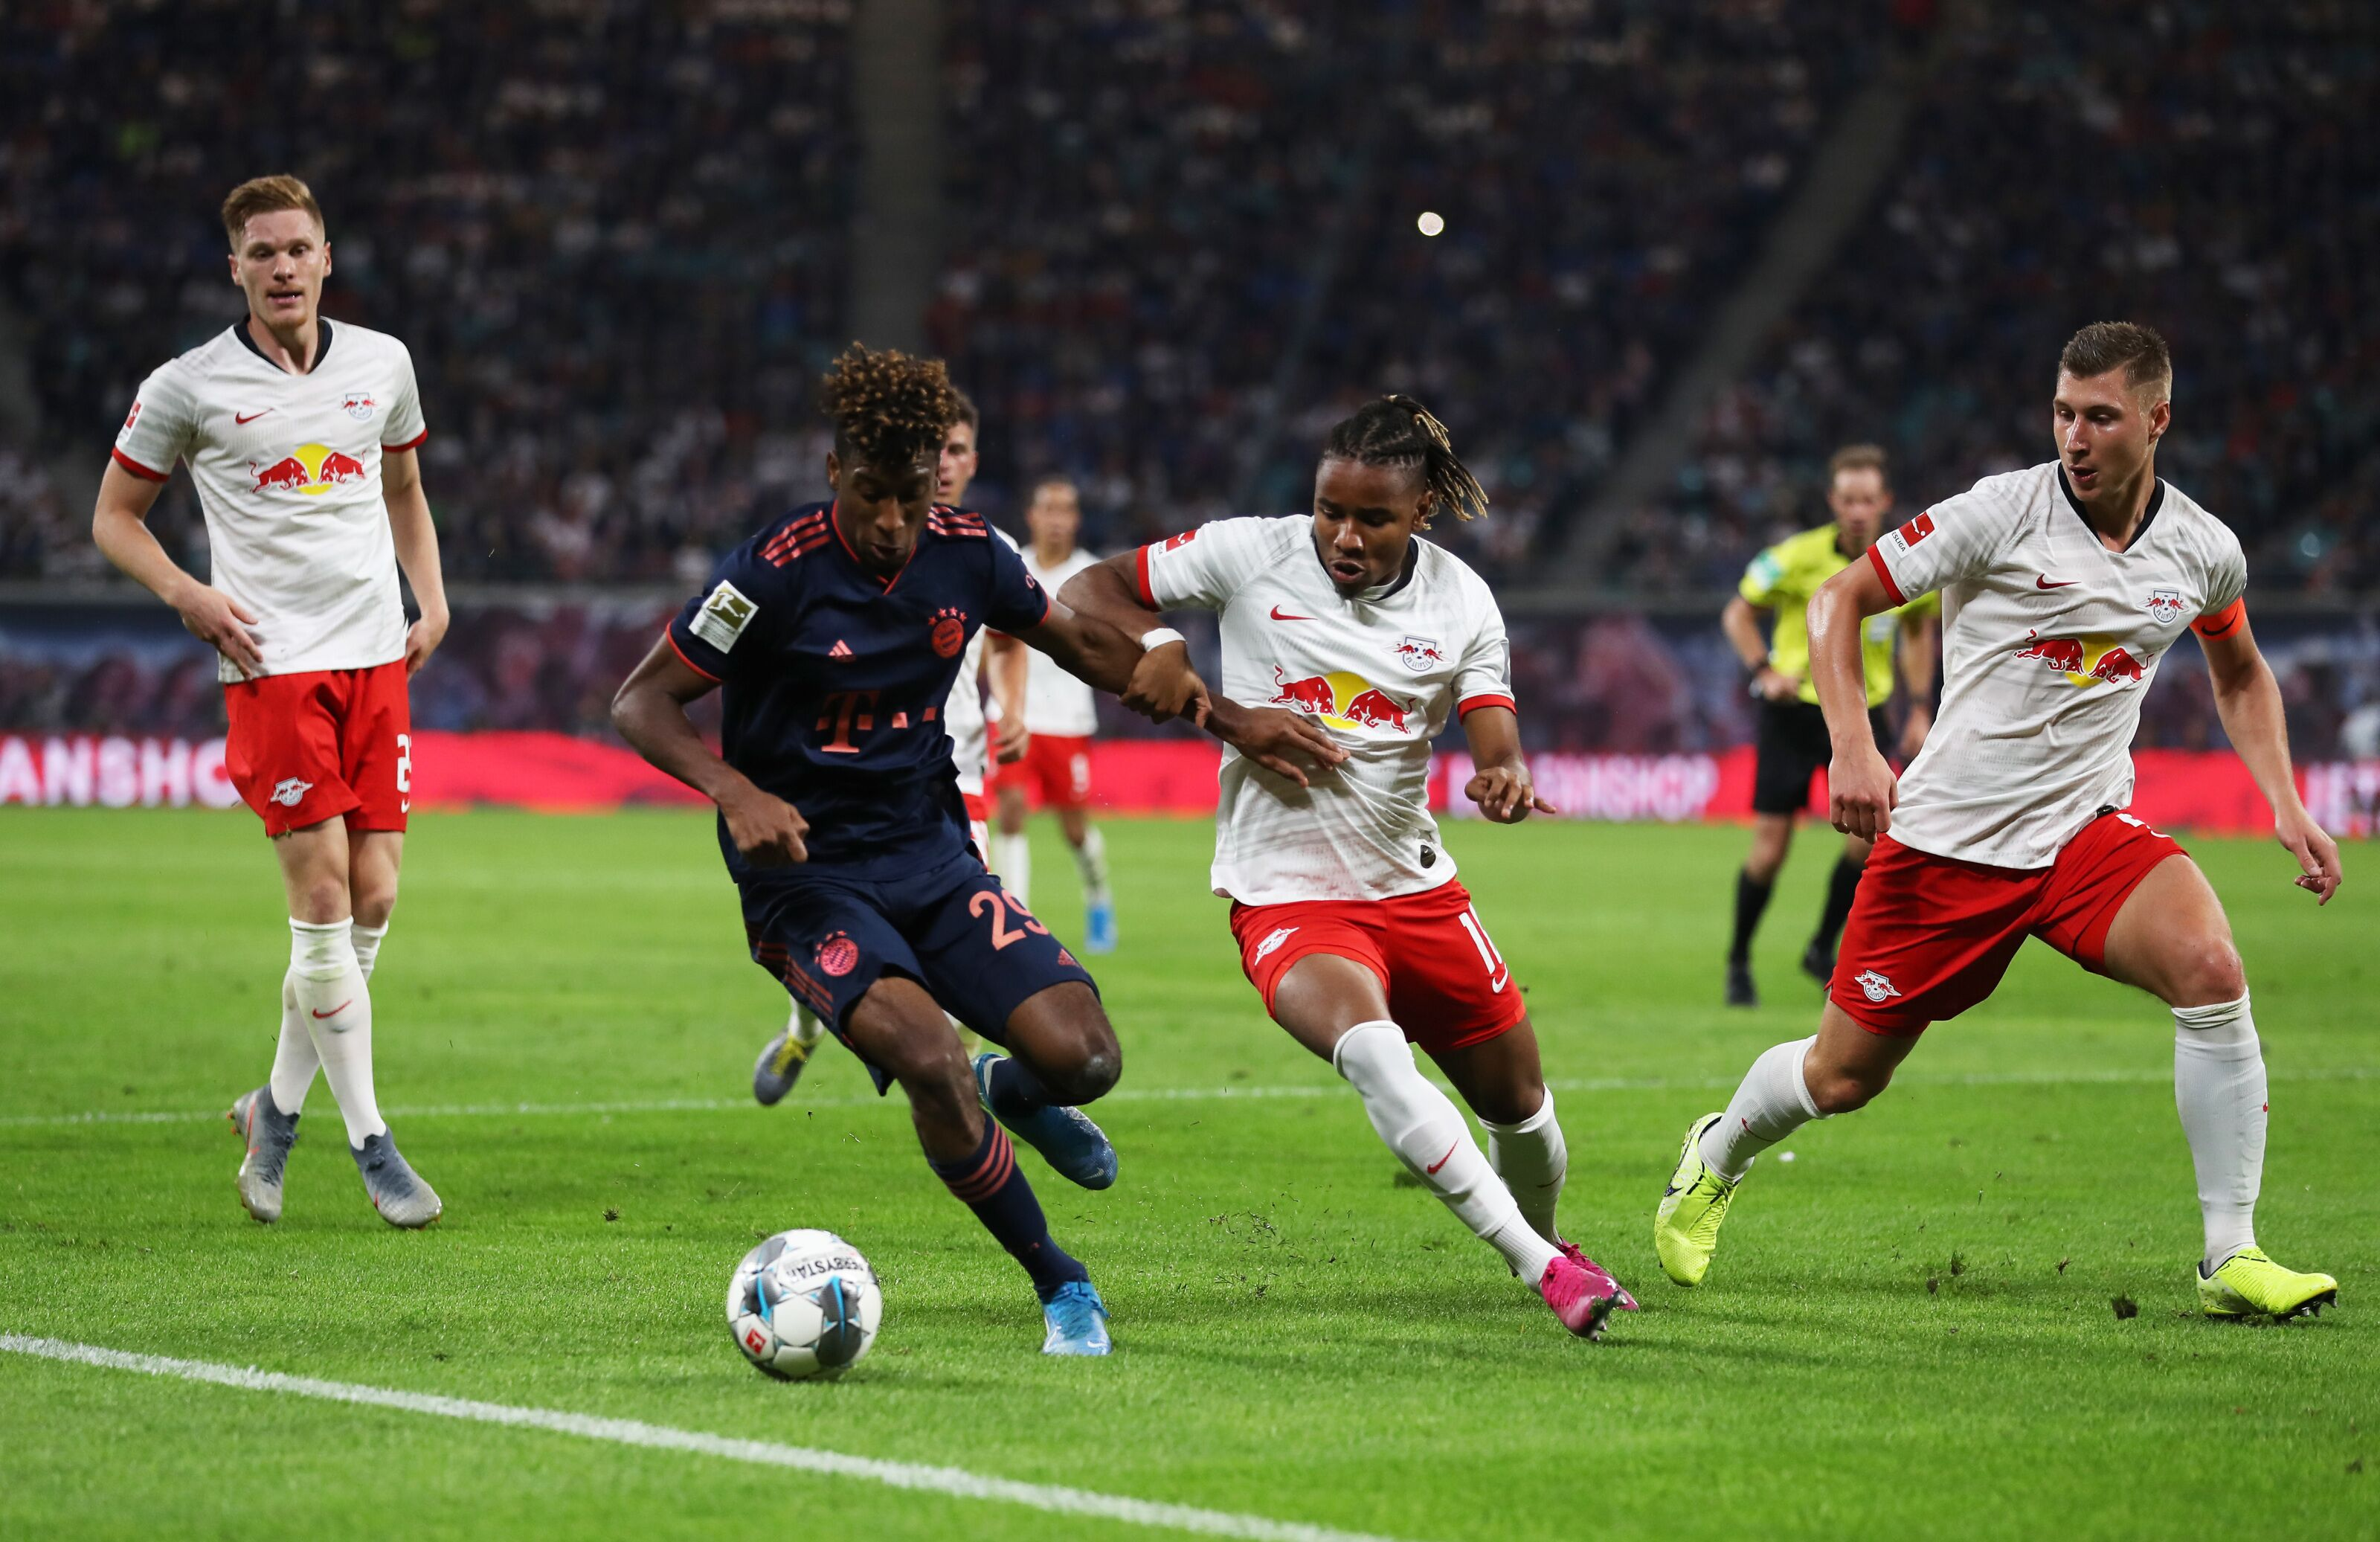 Bayern Munich drop points against RB Leipzig in Bundesliga